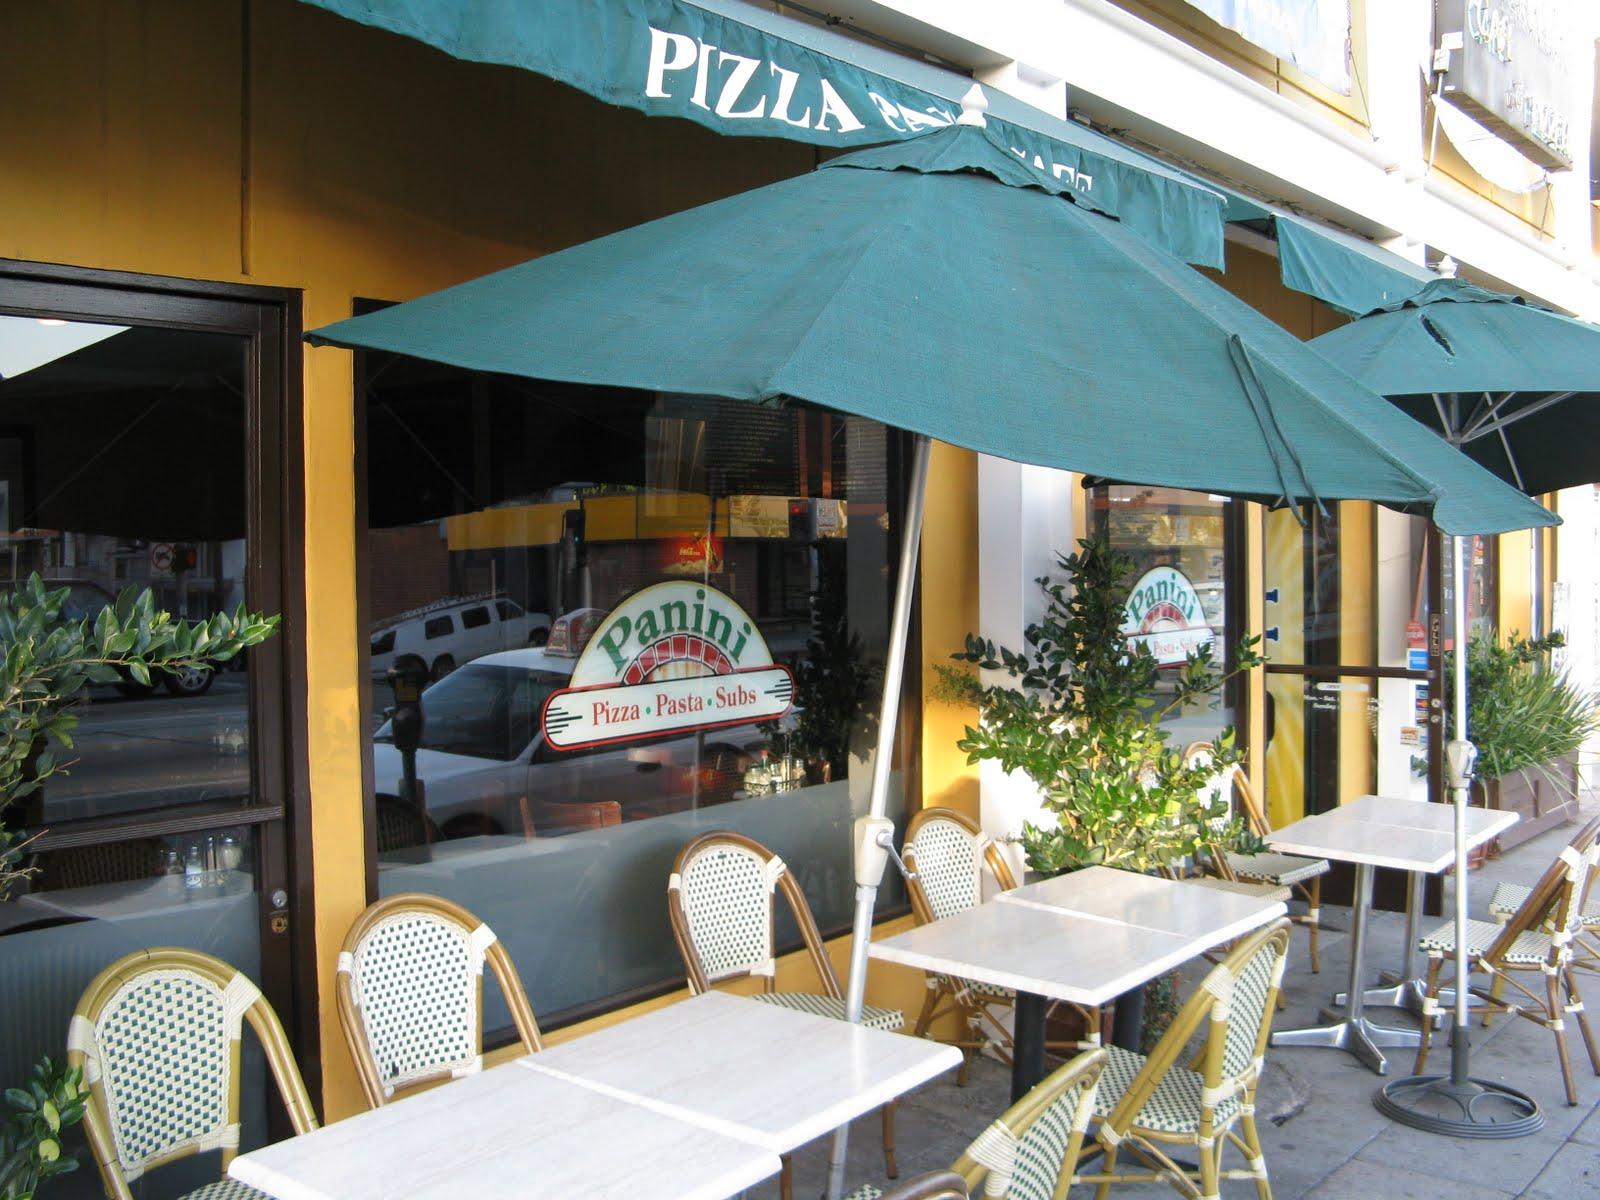 LA Pizza July 2008